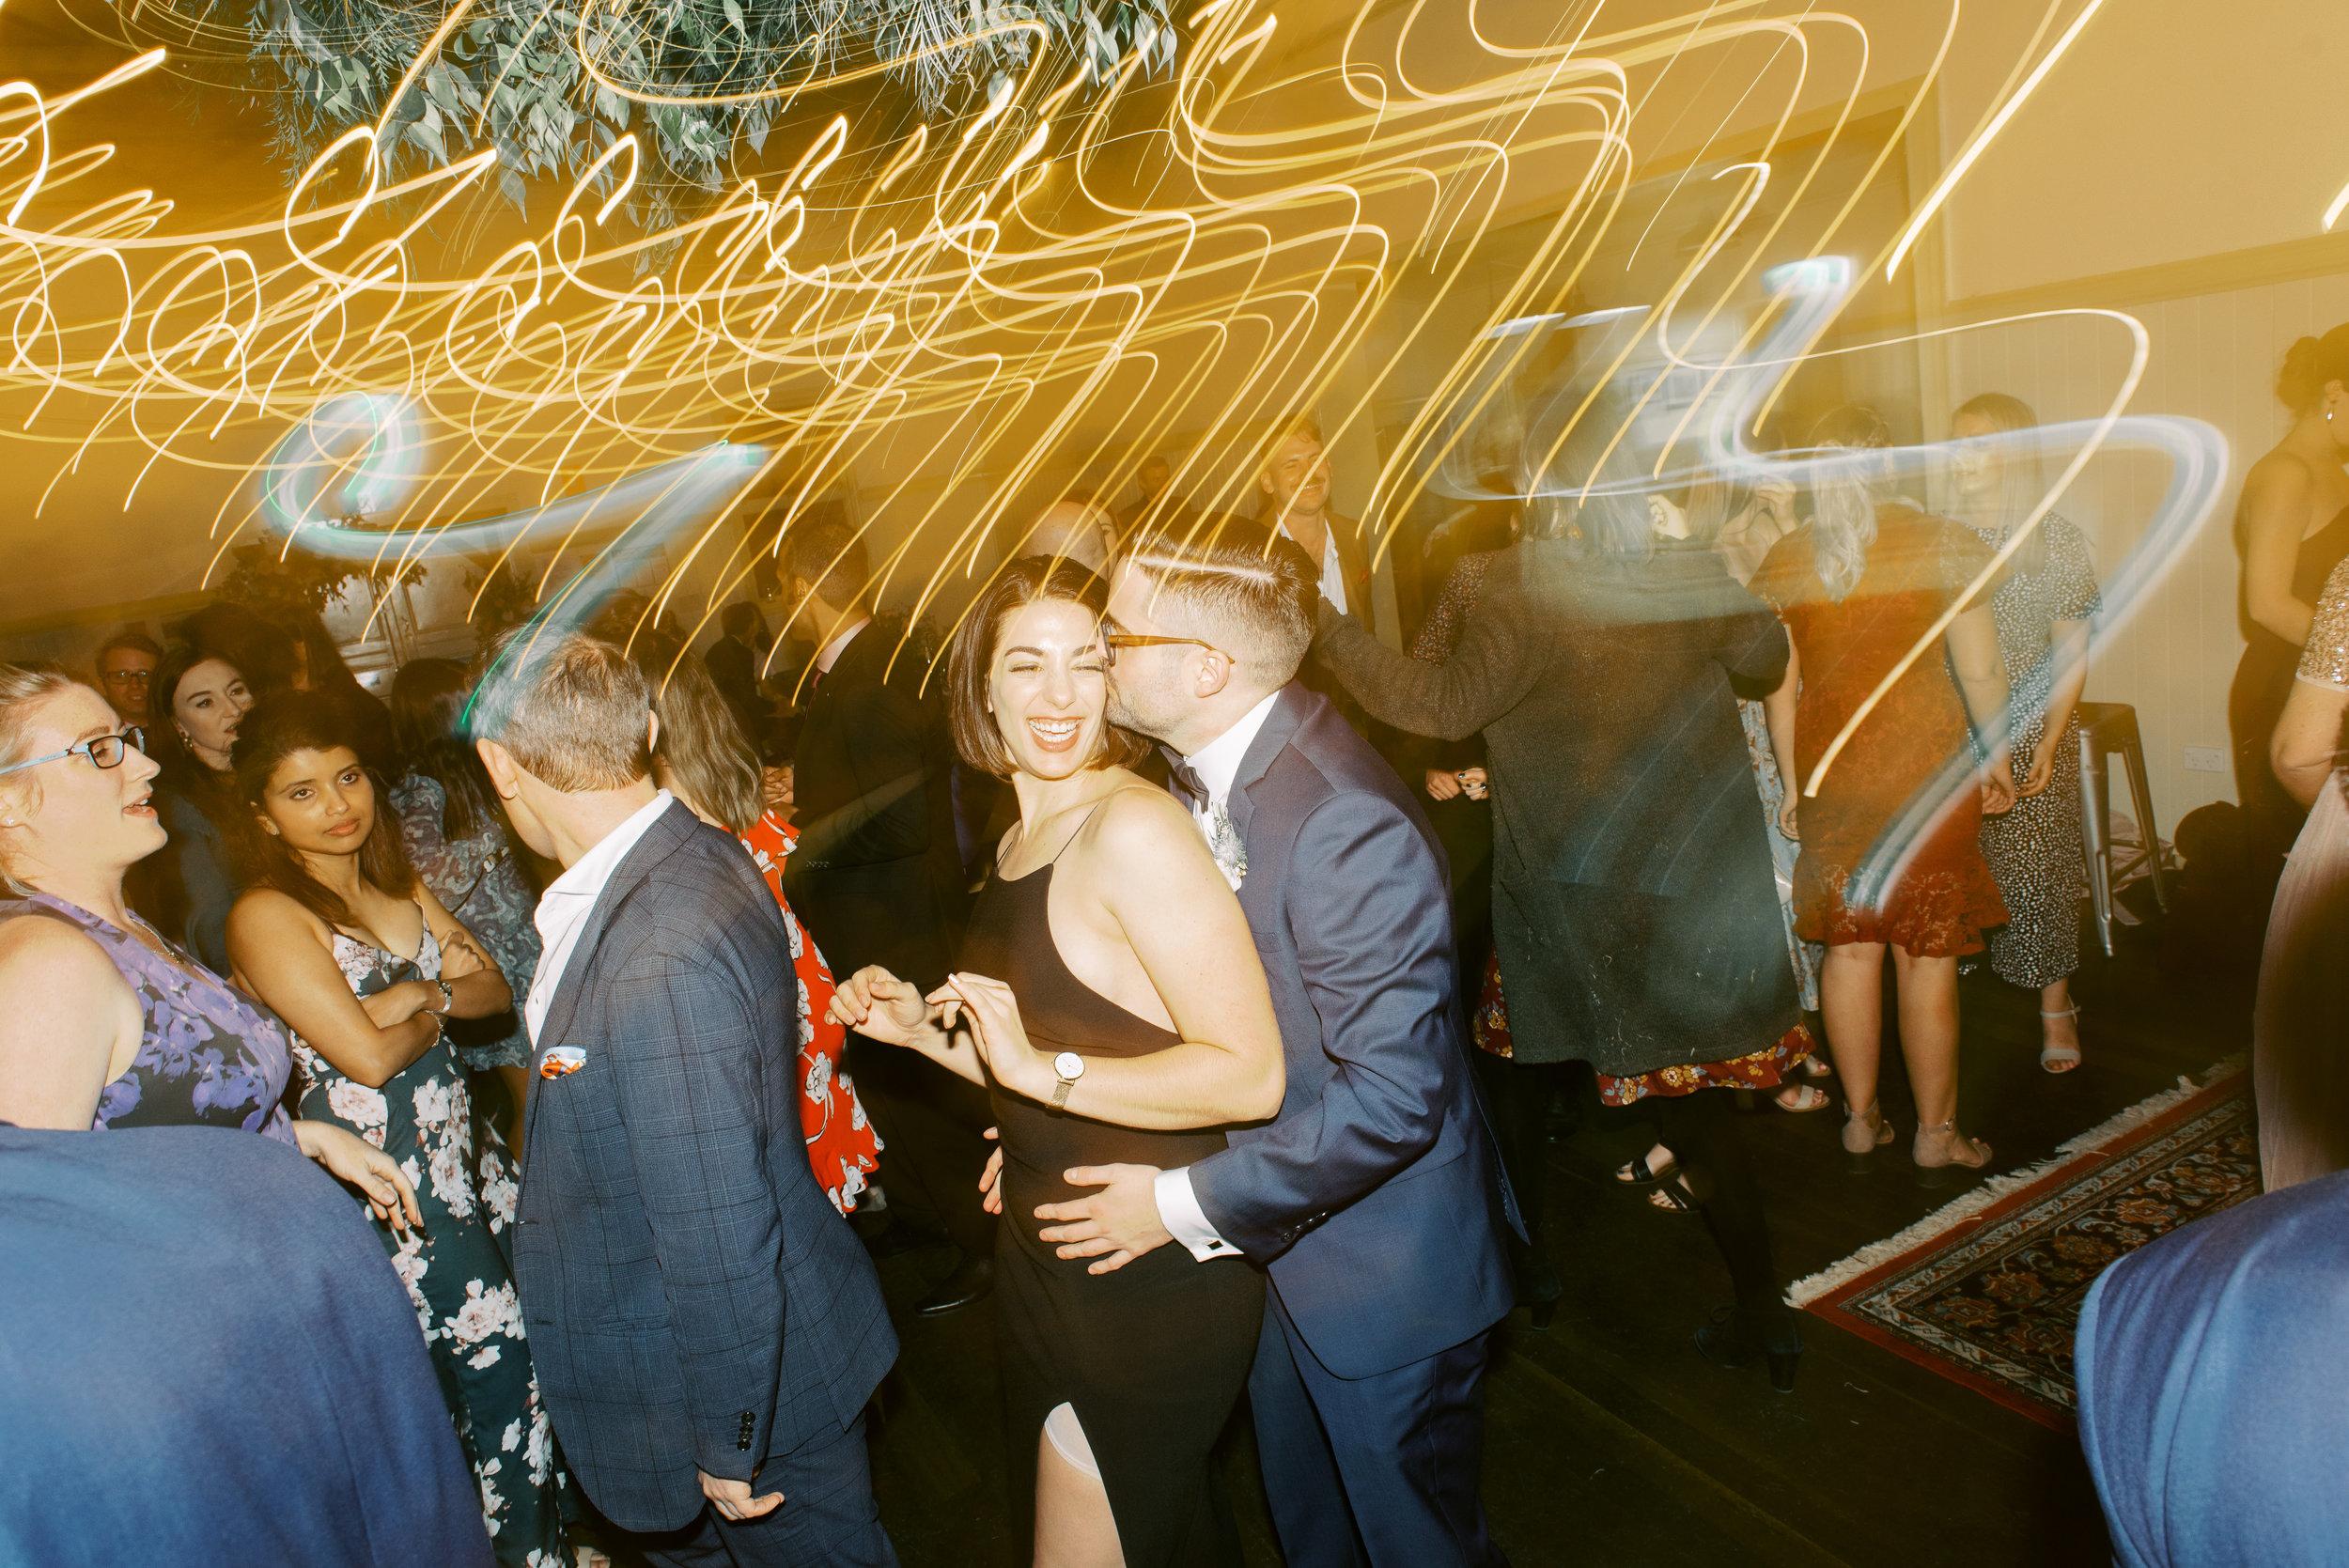 brisbane-gold-coast-sunshine-coast-tweed-romantic-fine-art-wedding-photography-lauren-olivia-87.jpg